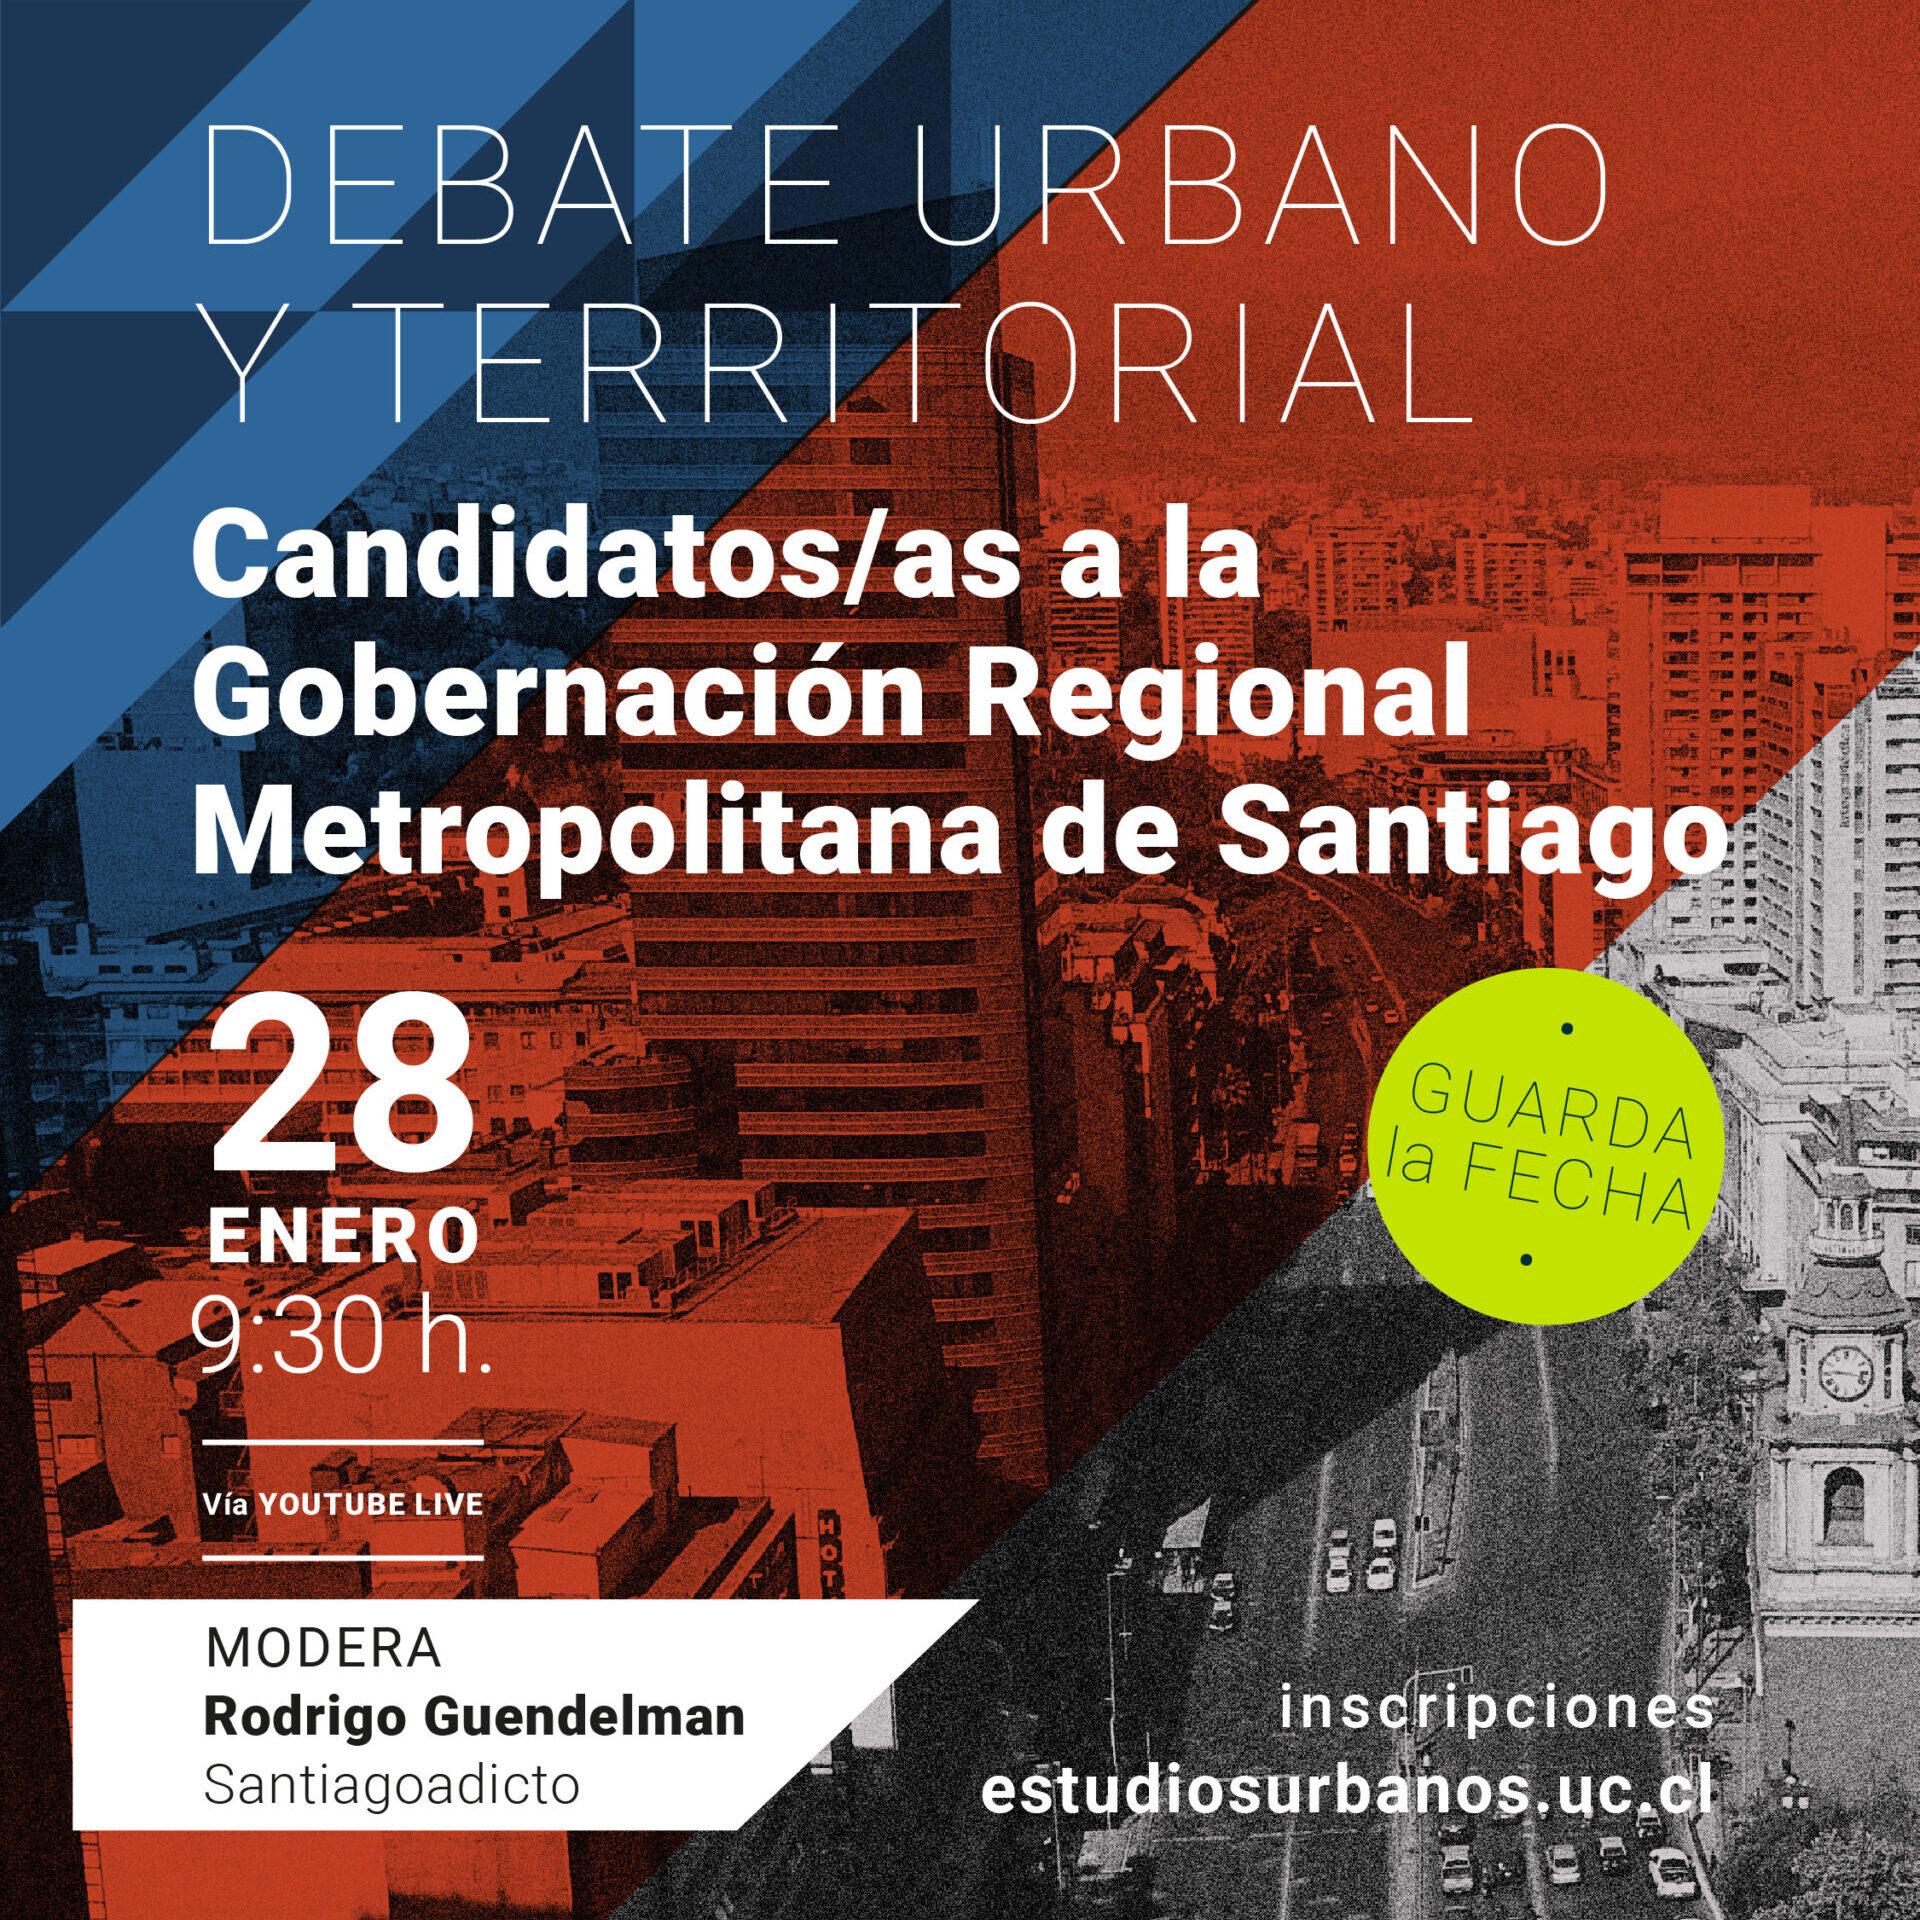 Debate Urbano y Territorial